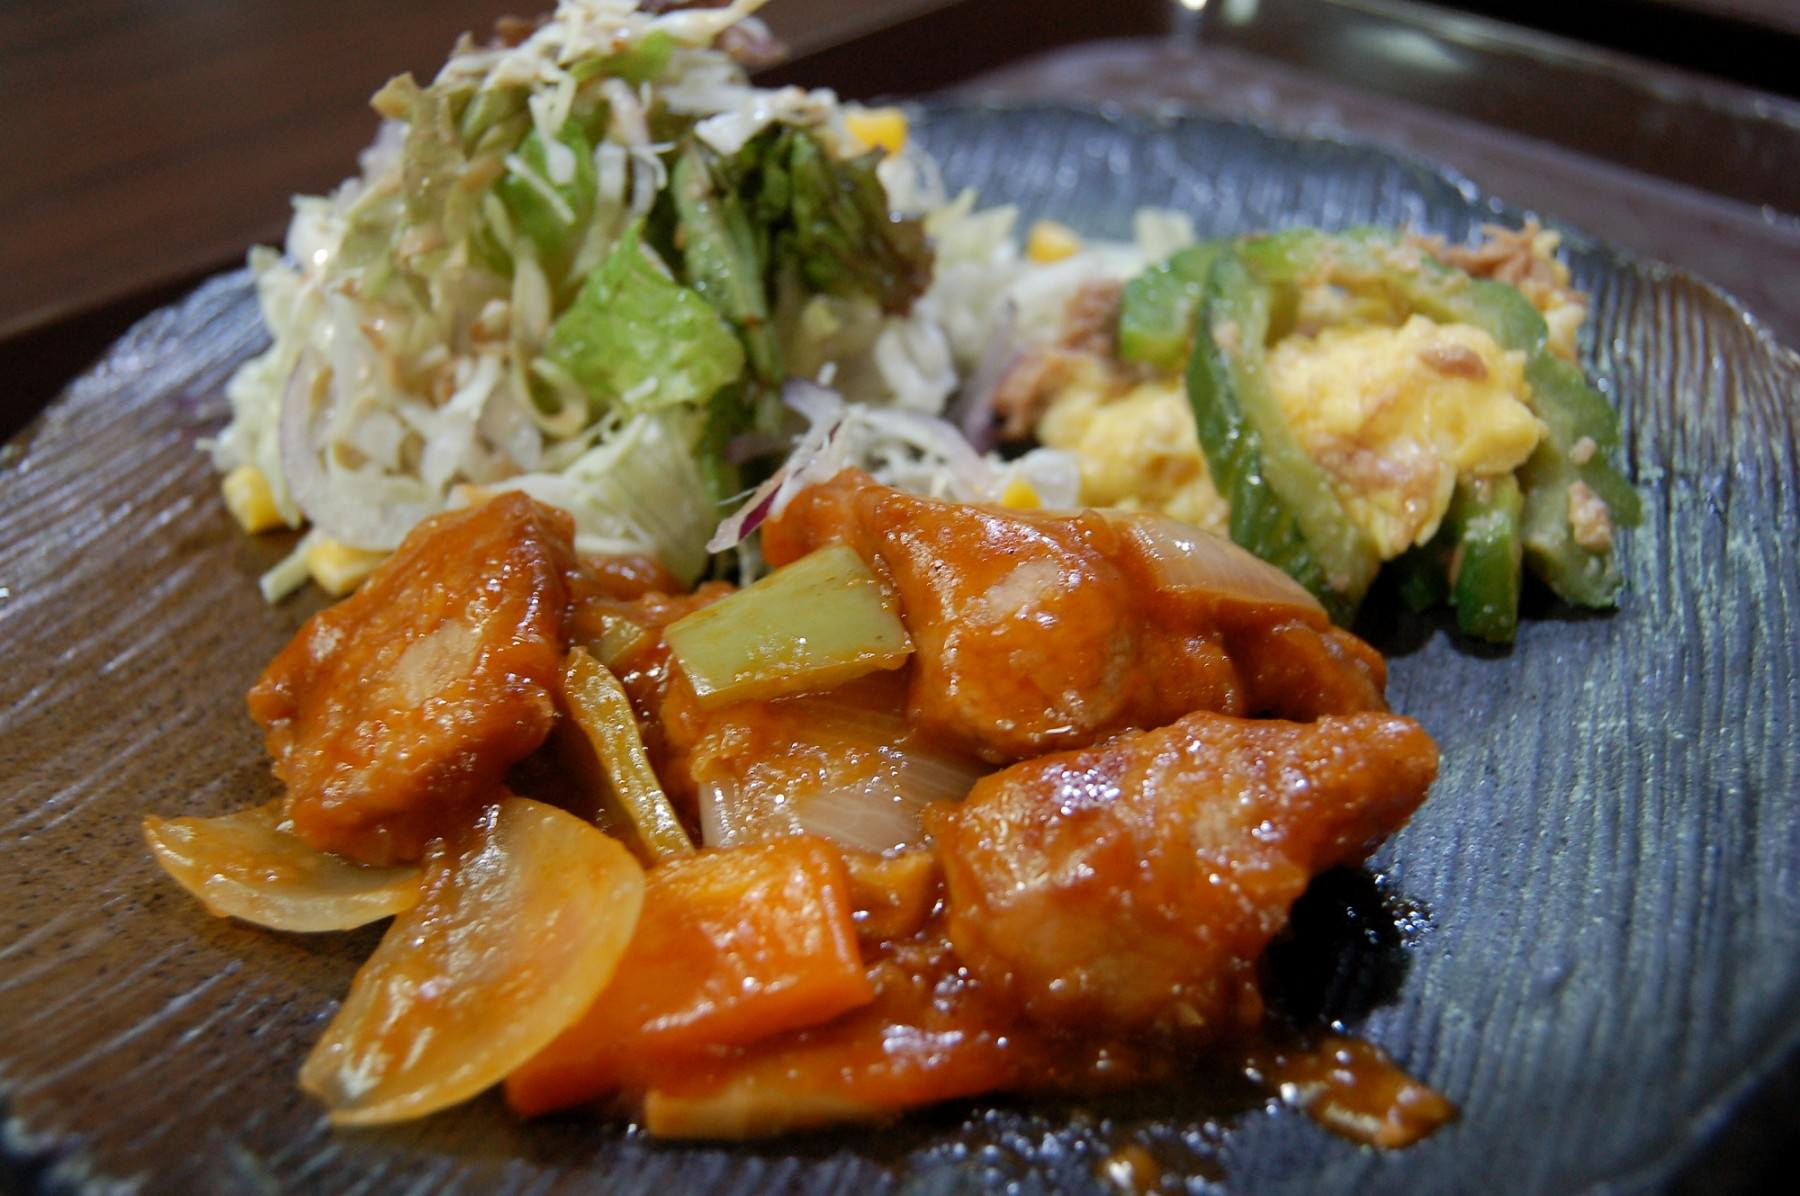 Stir Fried Pork with Sweet&Sour Sauce (2428)